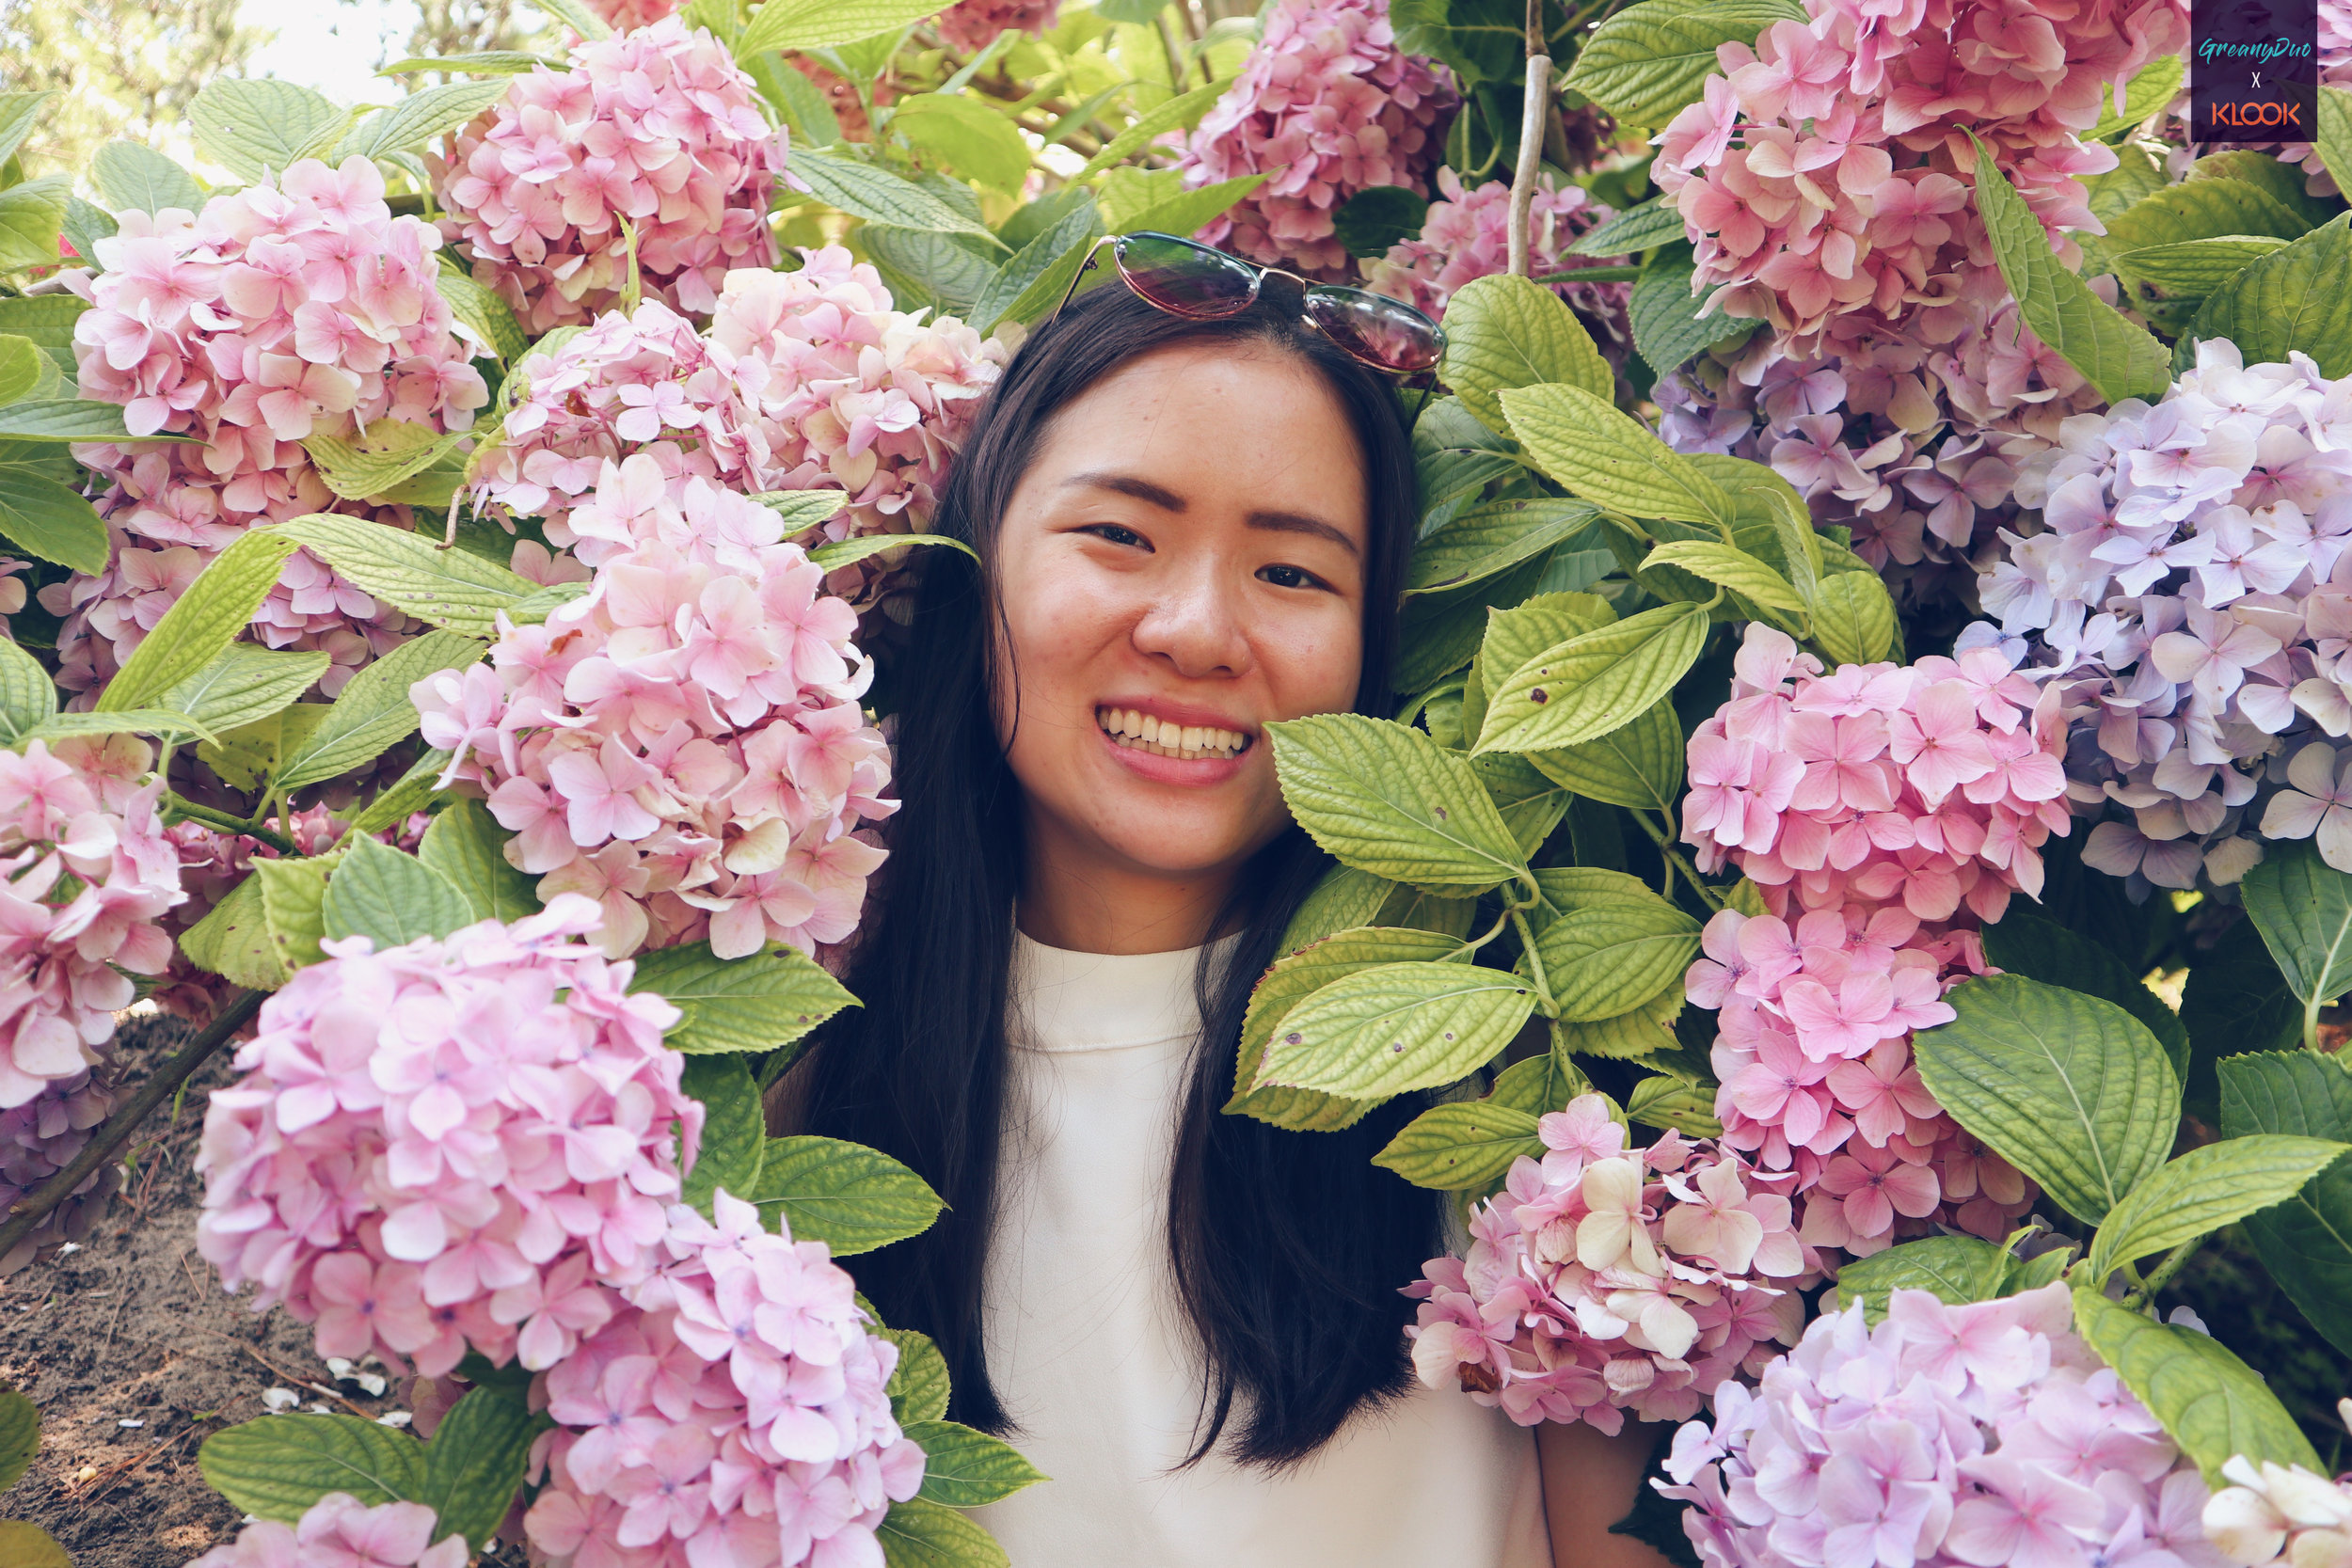 jenny posting with hydrangea flower at halliam park, jeju